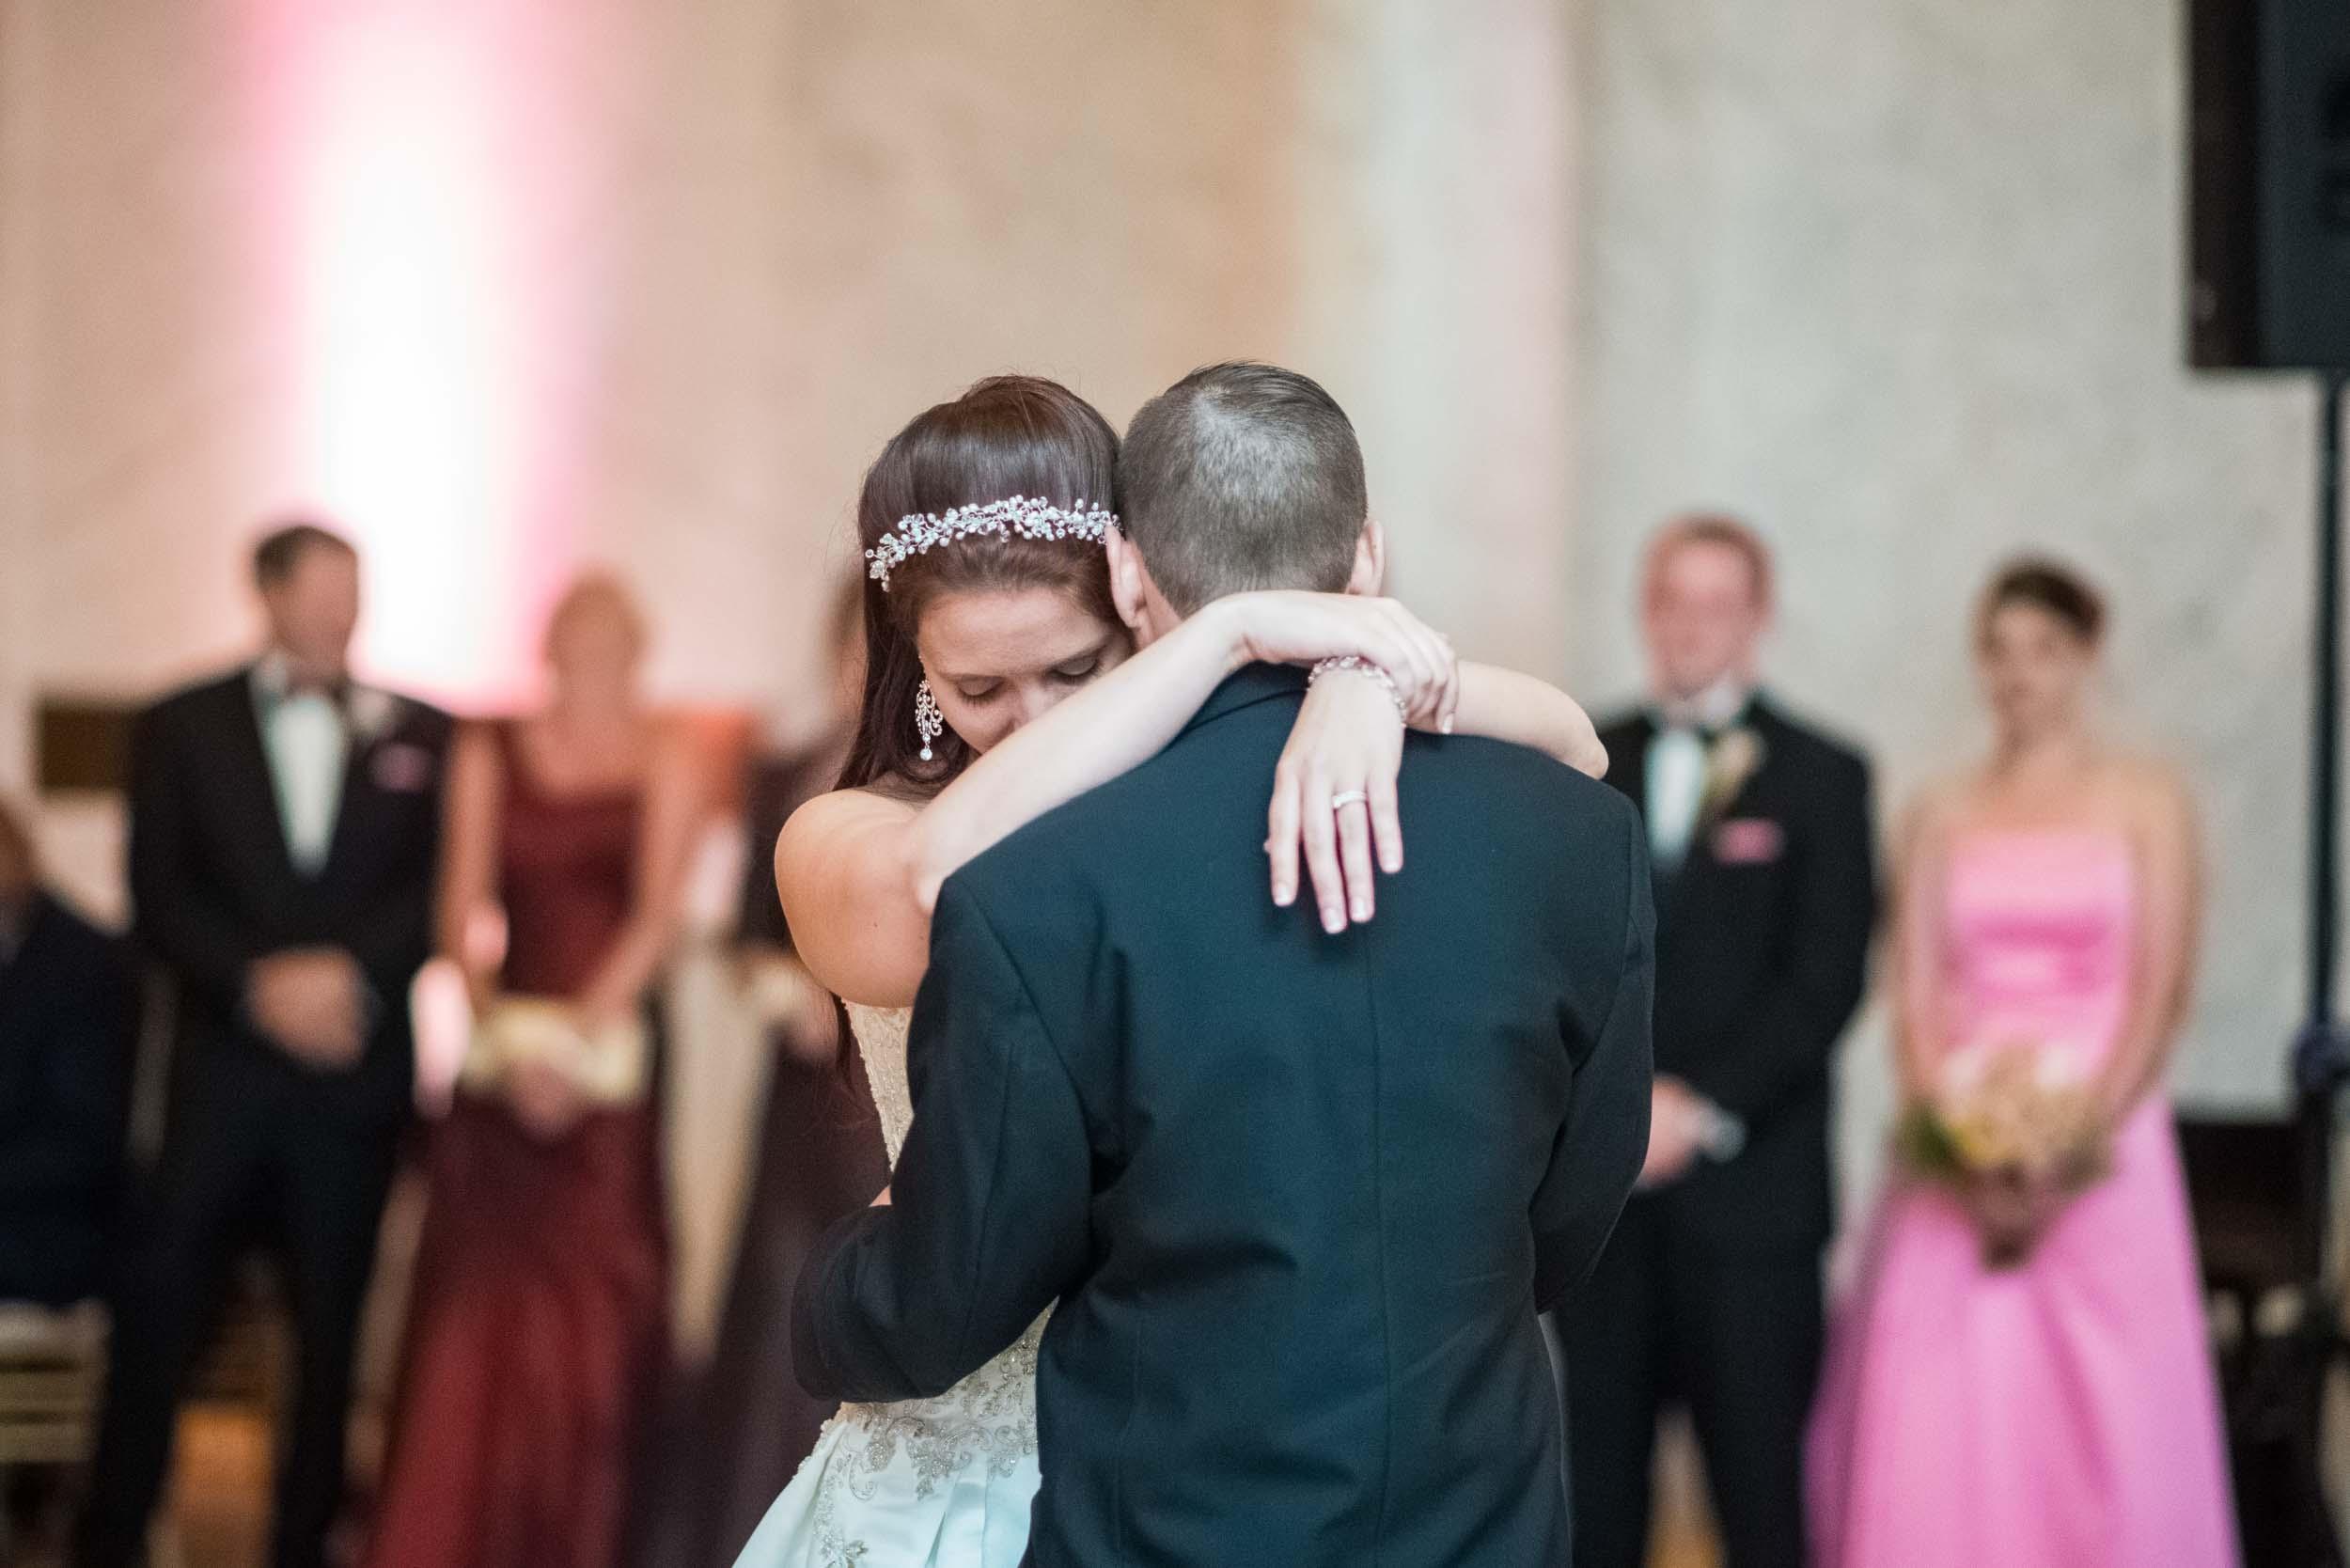 dc+metro+wedding+photographer+vadym+guliuk+photography+wedding+first+dance-2021.jpg